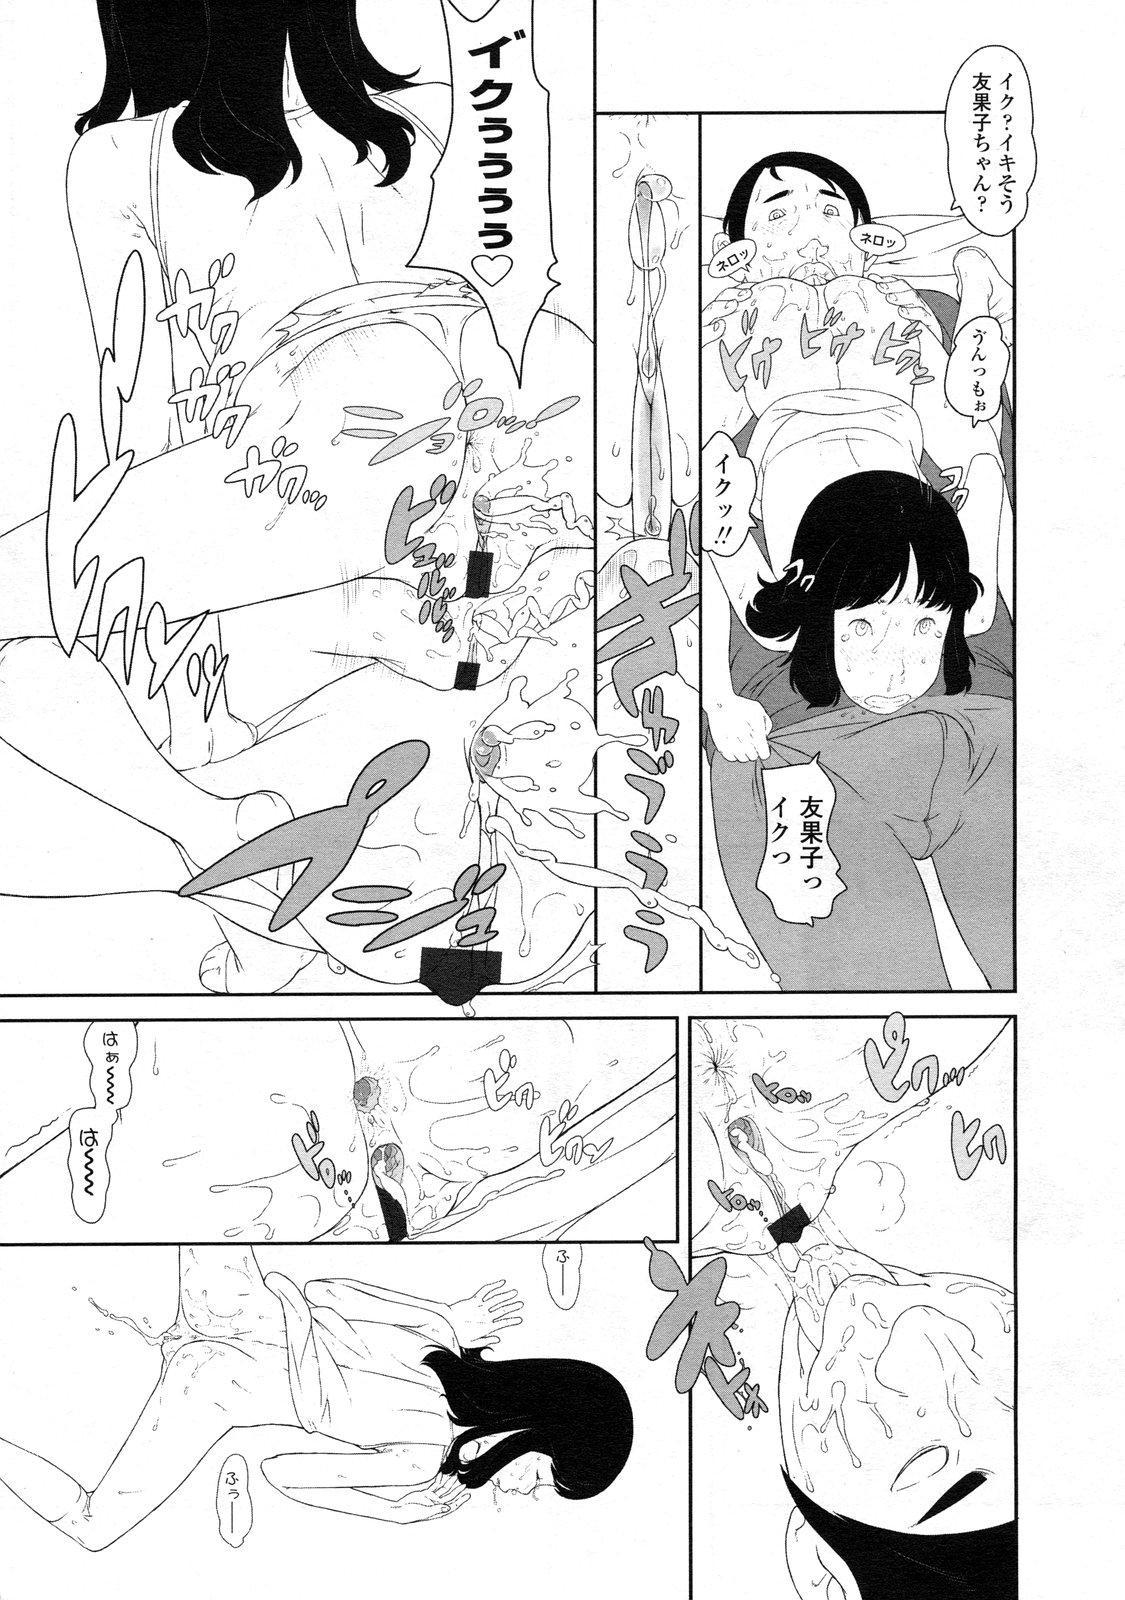 COMIC LO 2009-09 Vol. 66 59